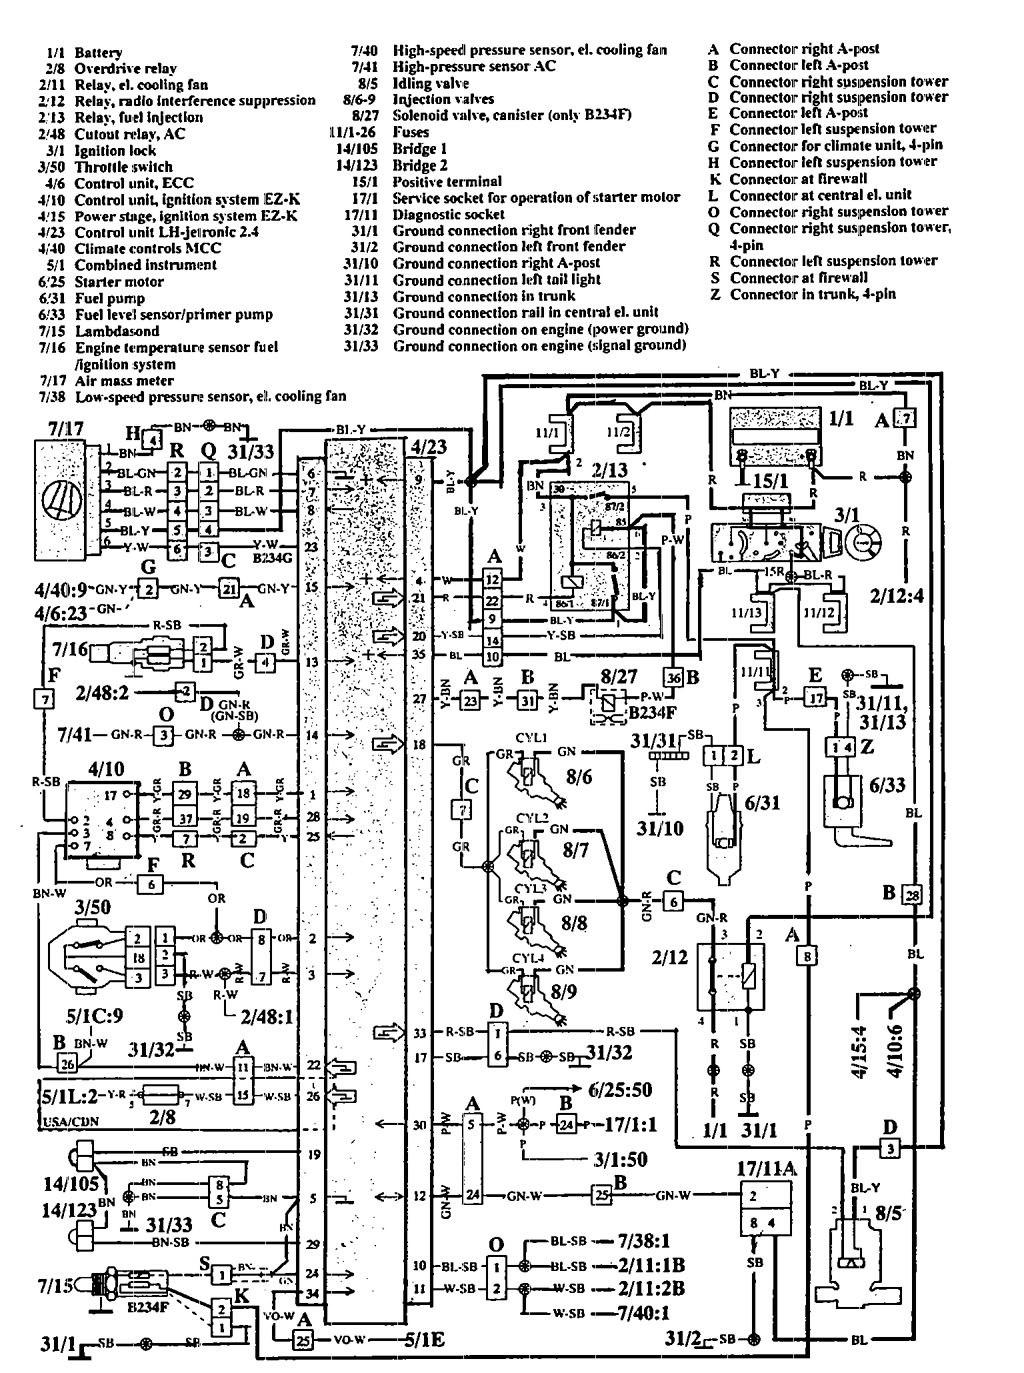 1995 Volvo 940 Engine Diagram Wiring Schematic 740 Stereo Database1995 Radio Diagrams Click